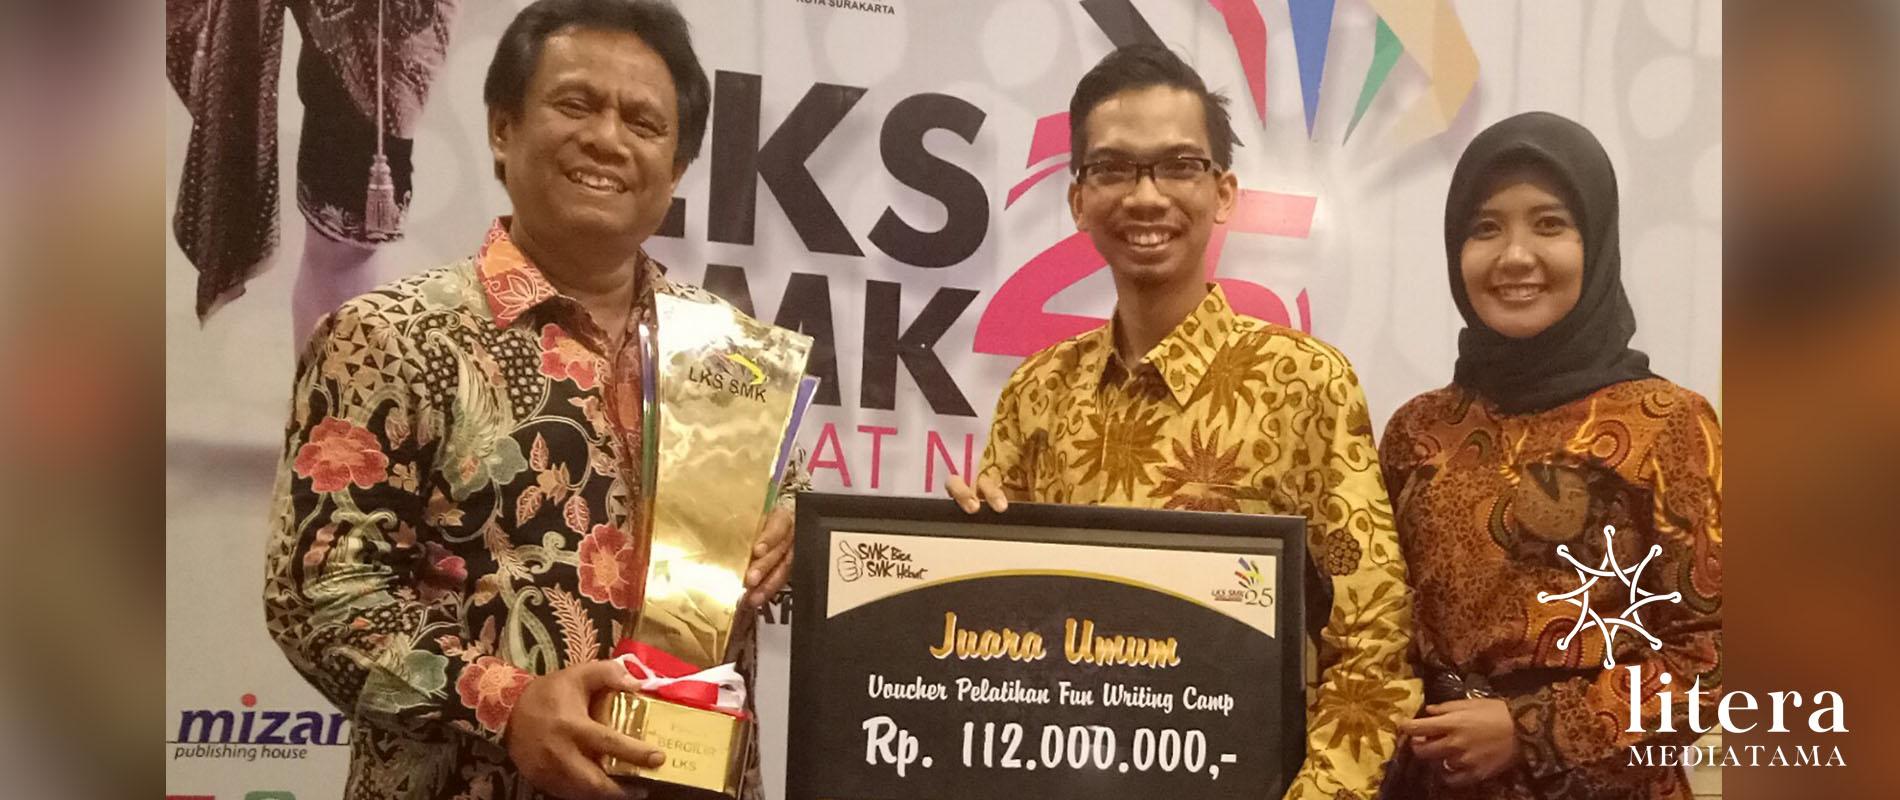 Penerbit Litera memberikan Hadiah kepada Juara Umum LKS Nasional di Solo. Diwakili Kepala Dinas Pendidikan Provinsi Jawa Tengah